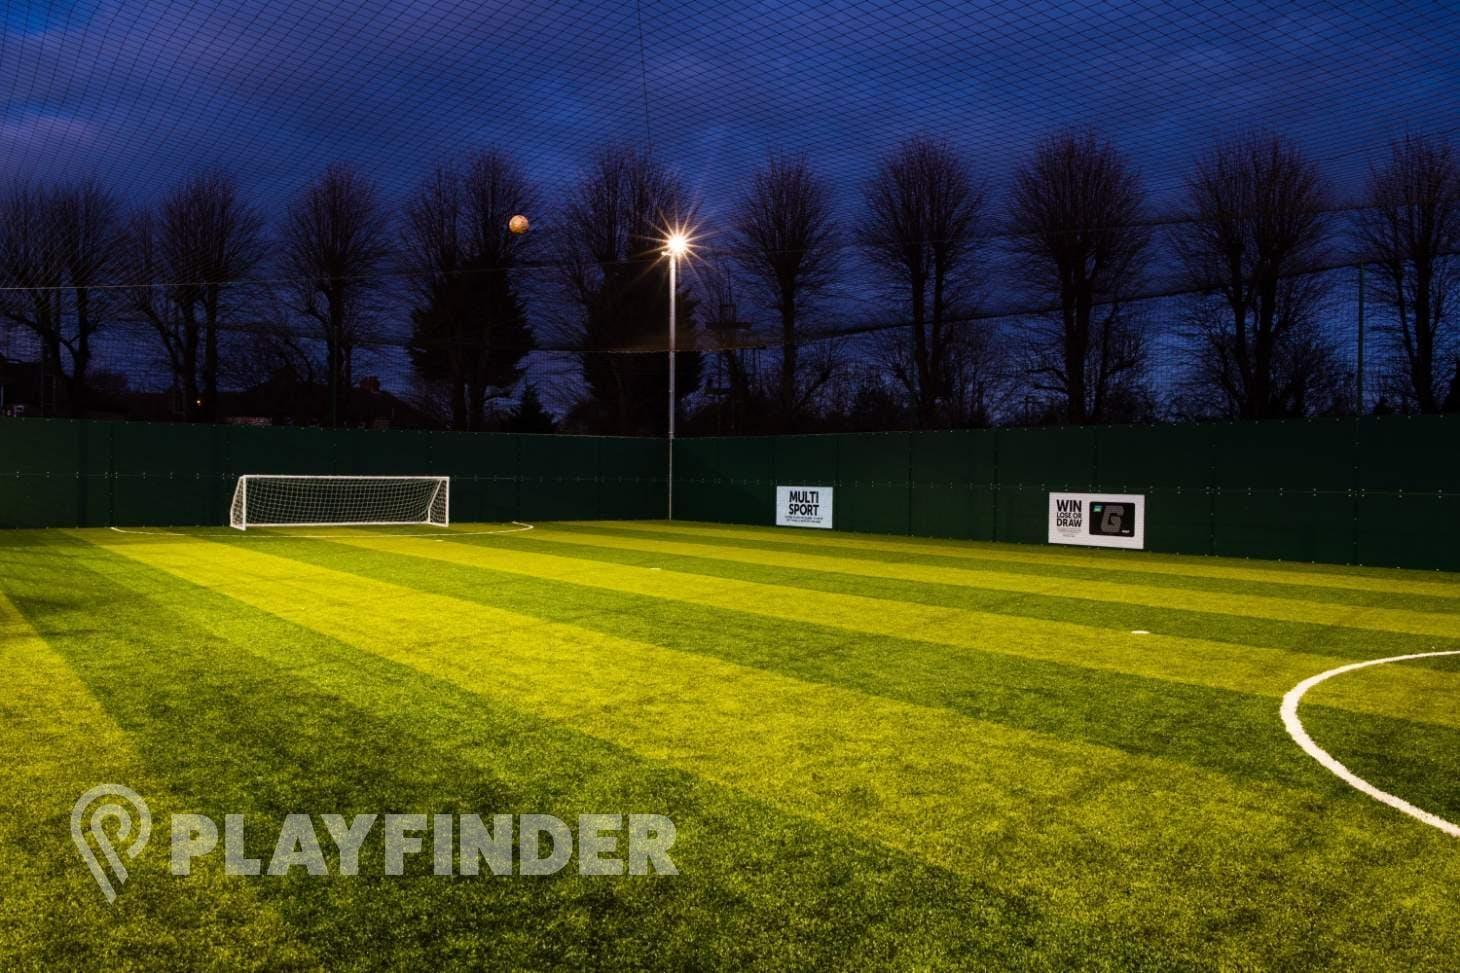 Powerleague Enfield 5 a side | 3G Astroturf football pitch